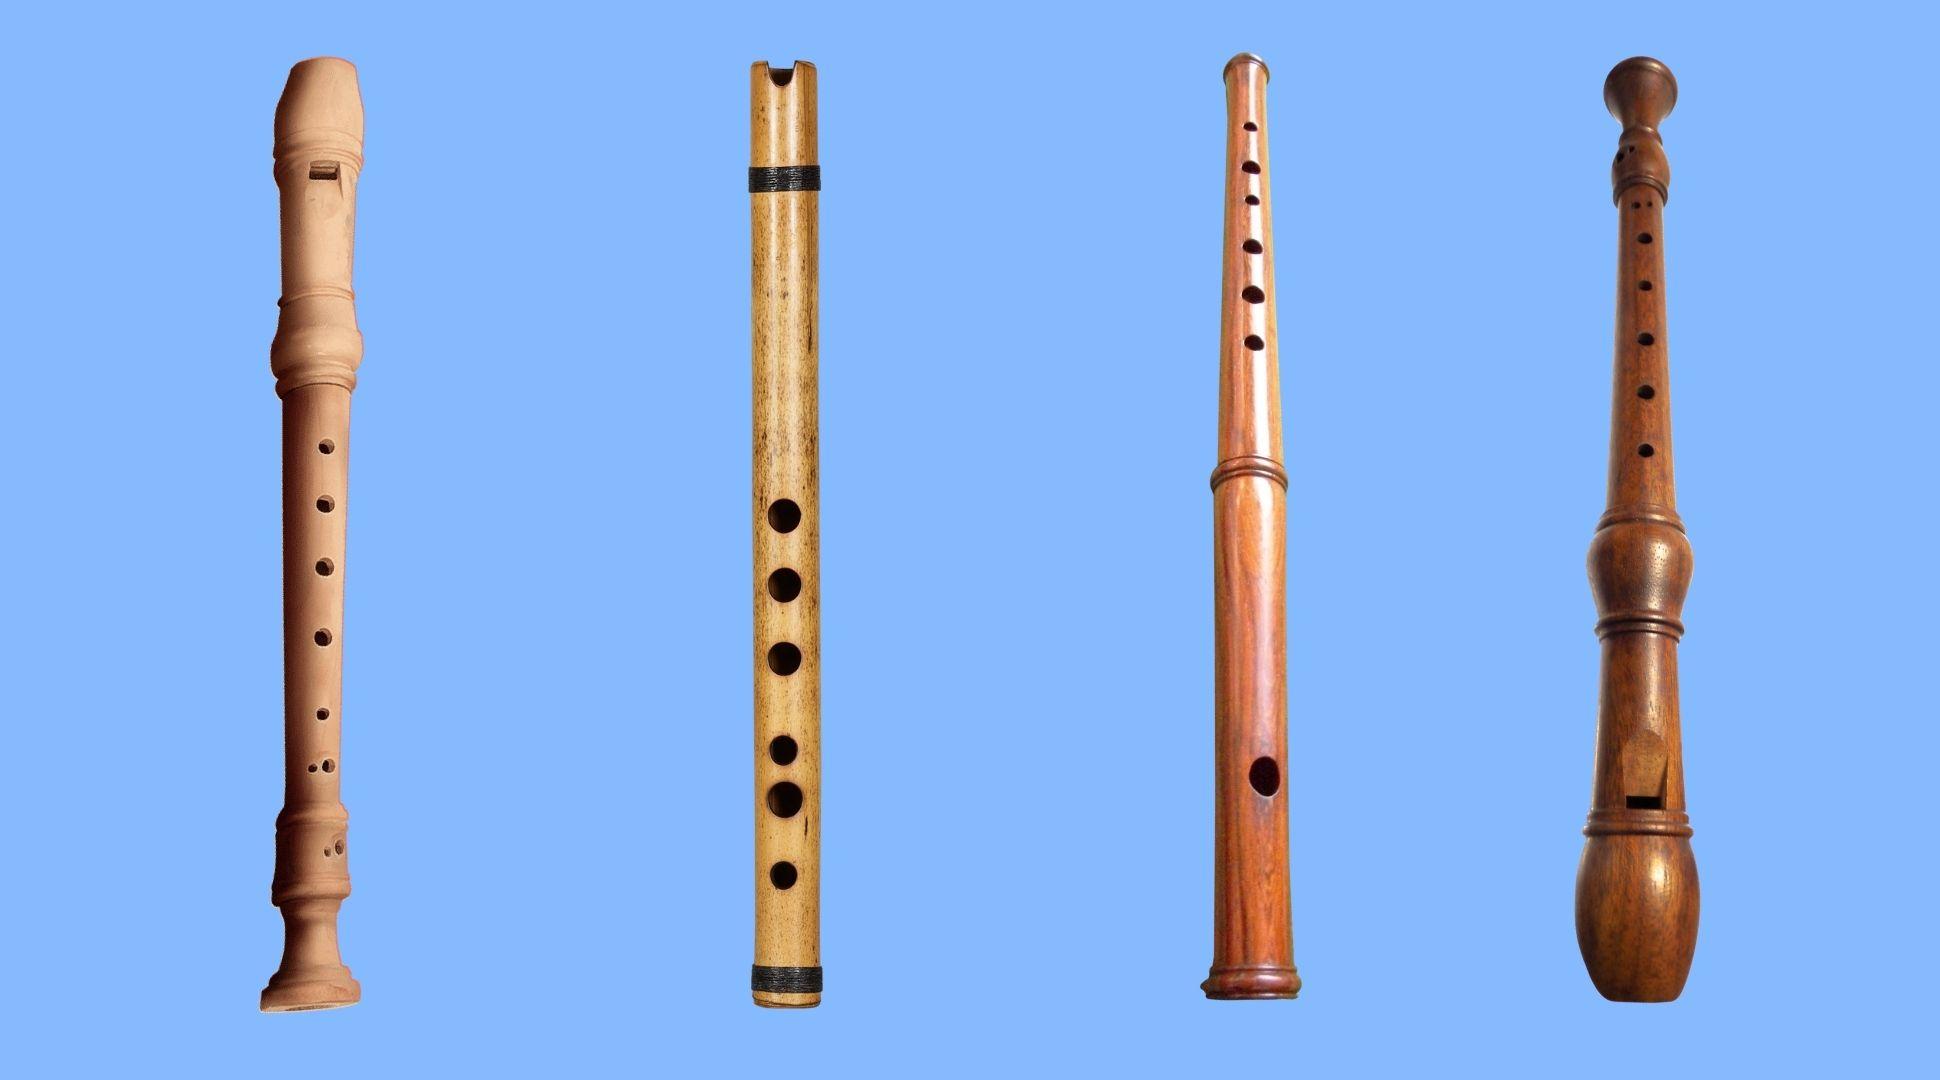 miglior-flauto-dolce